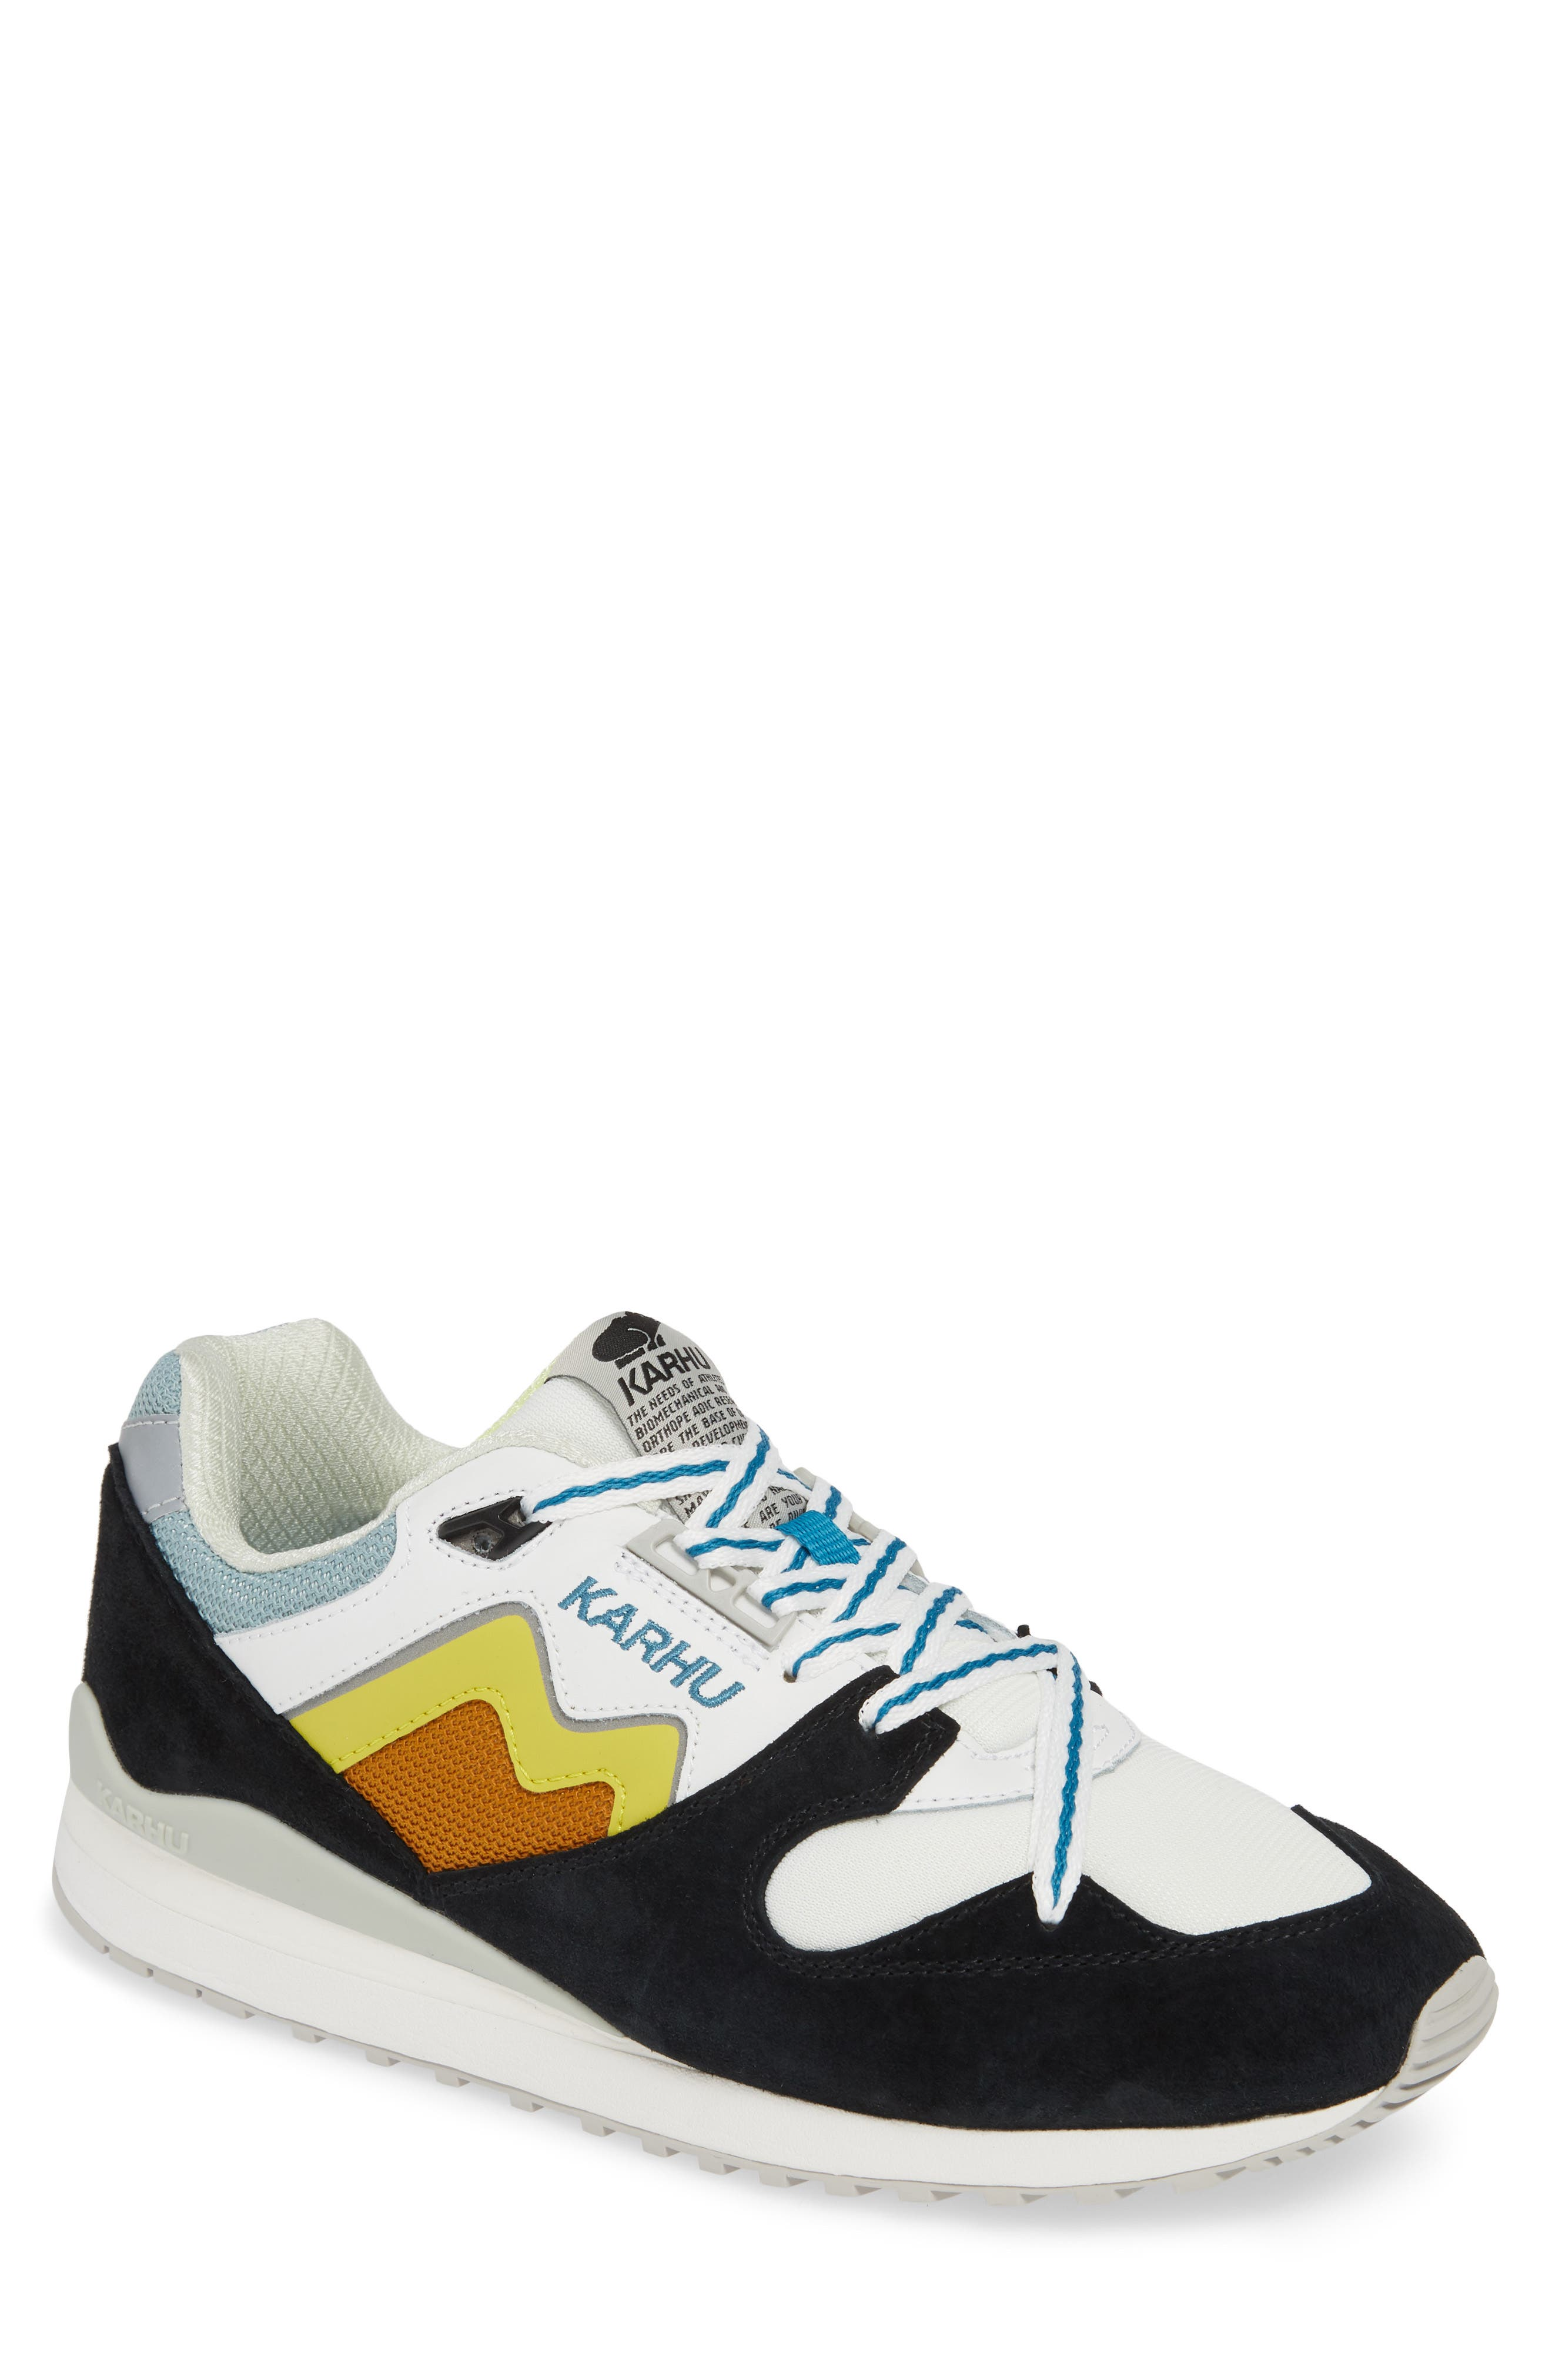 9328abe943d Men s Karhu Shoes